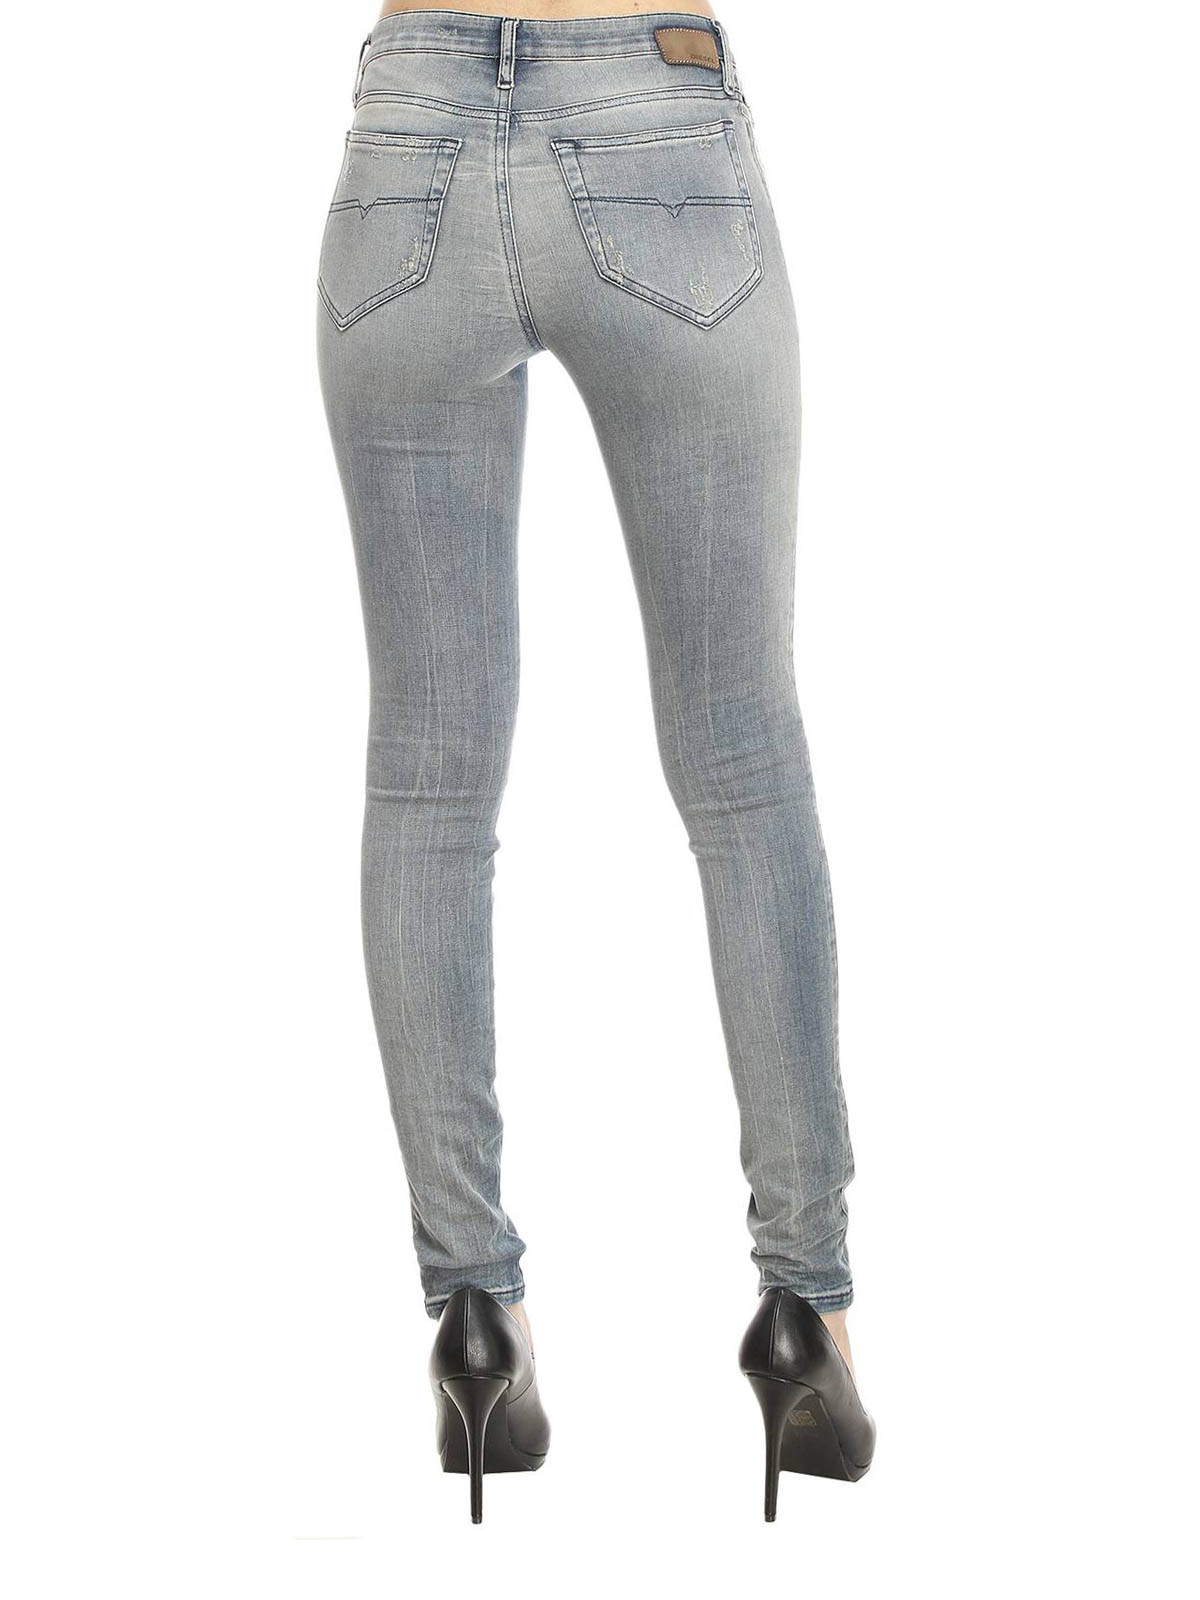 Skinzee super skinny jeans by Diesel - skinny jeans   iKRIX